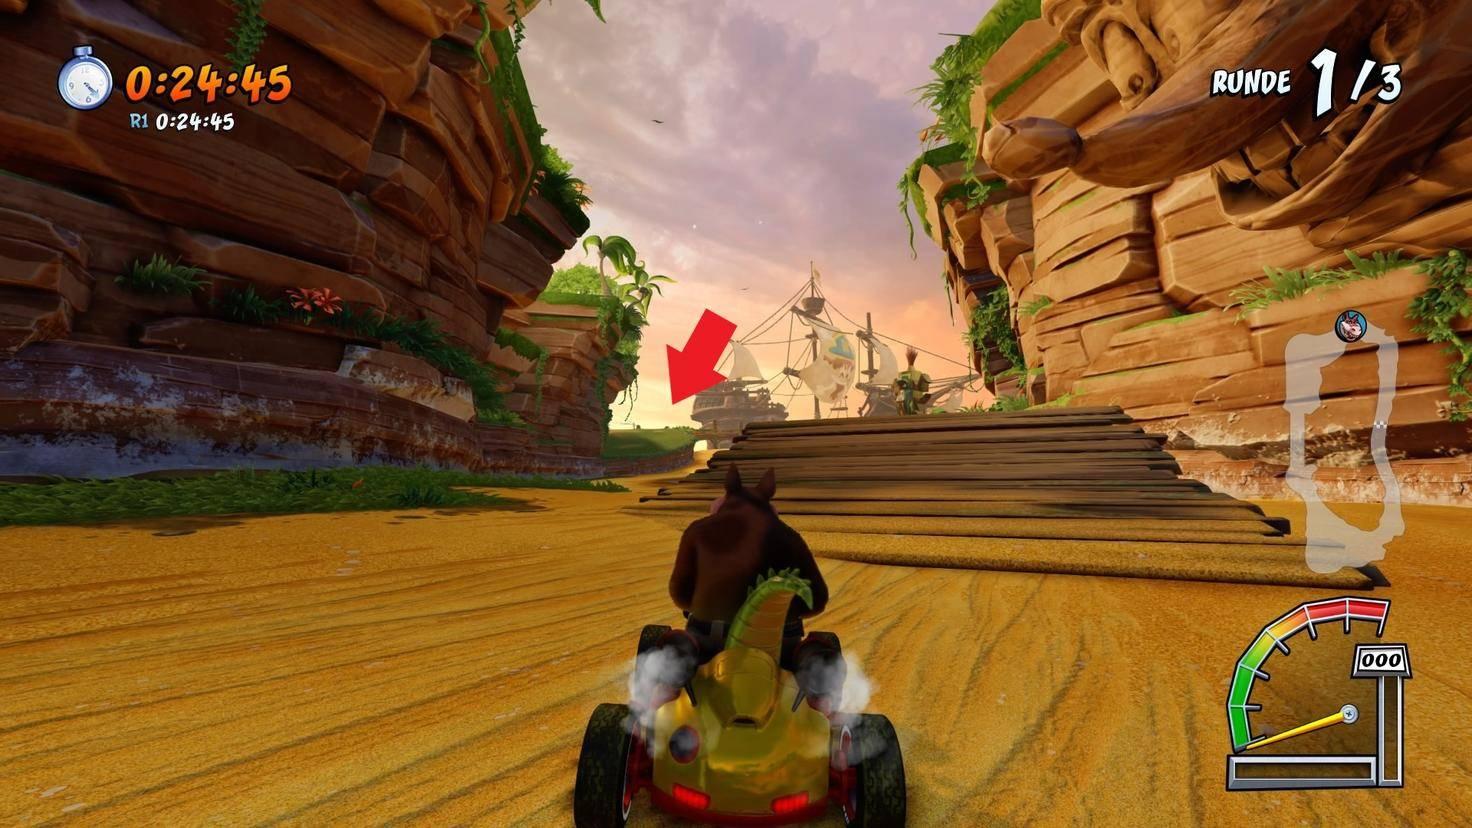 Crash-Team-Racing-Nitro-Fueled-Abkürzung-Crash-Bucht-2